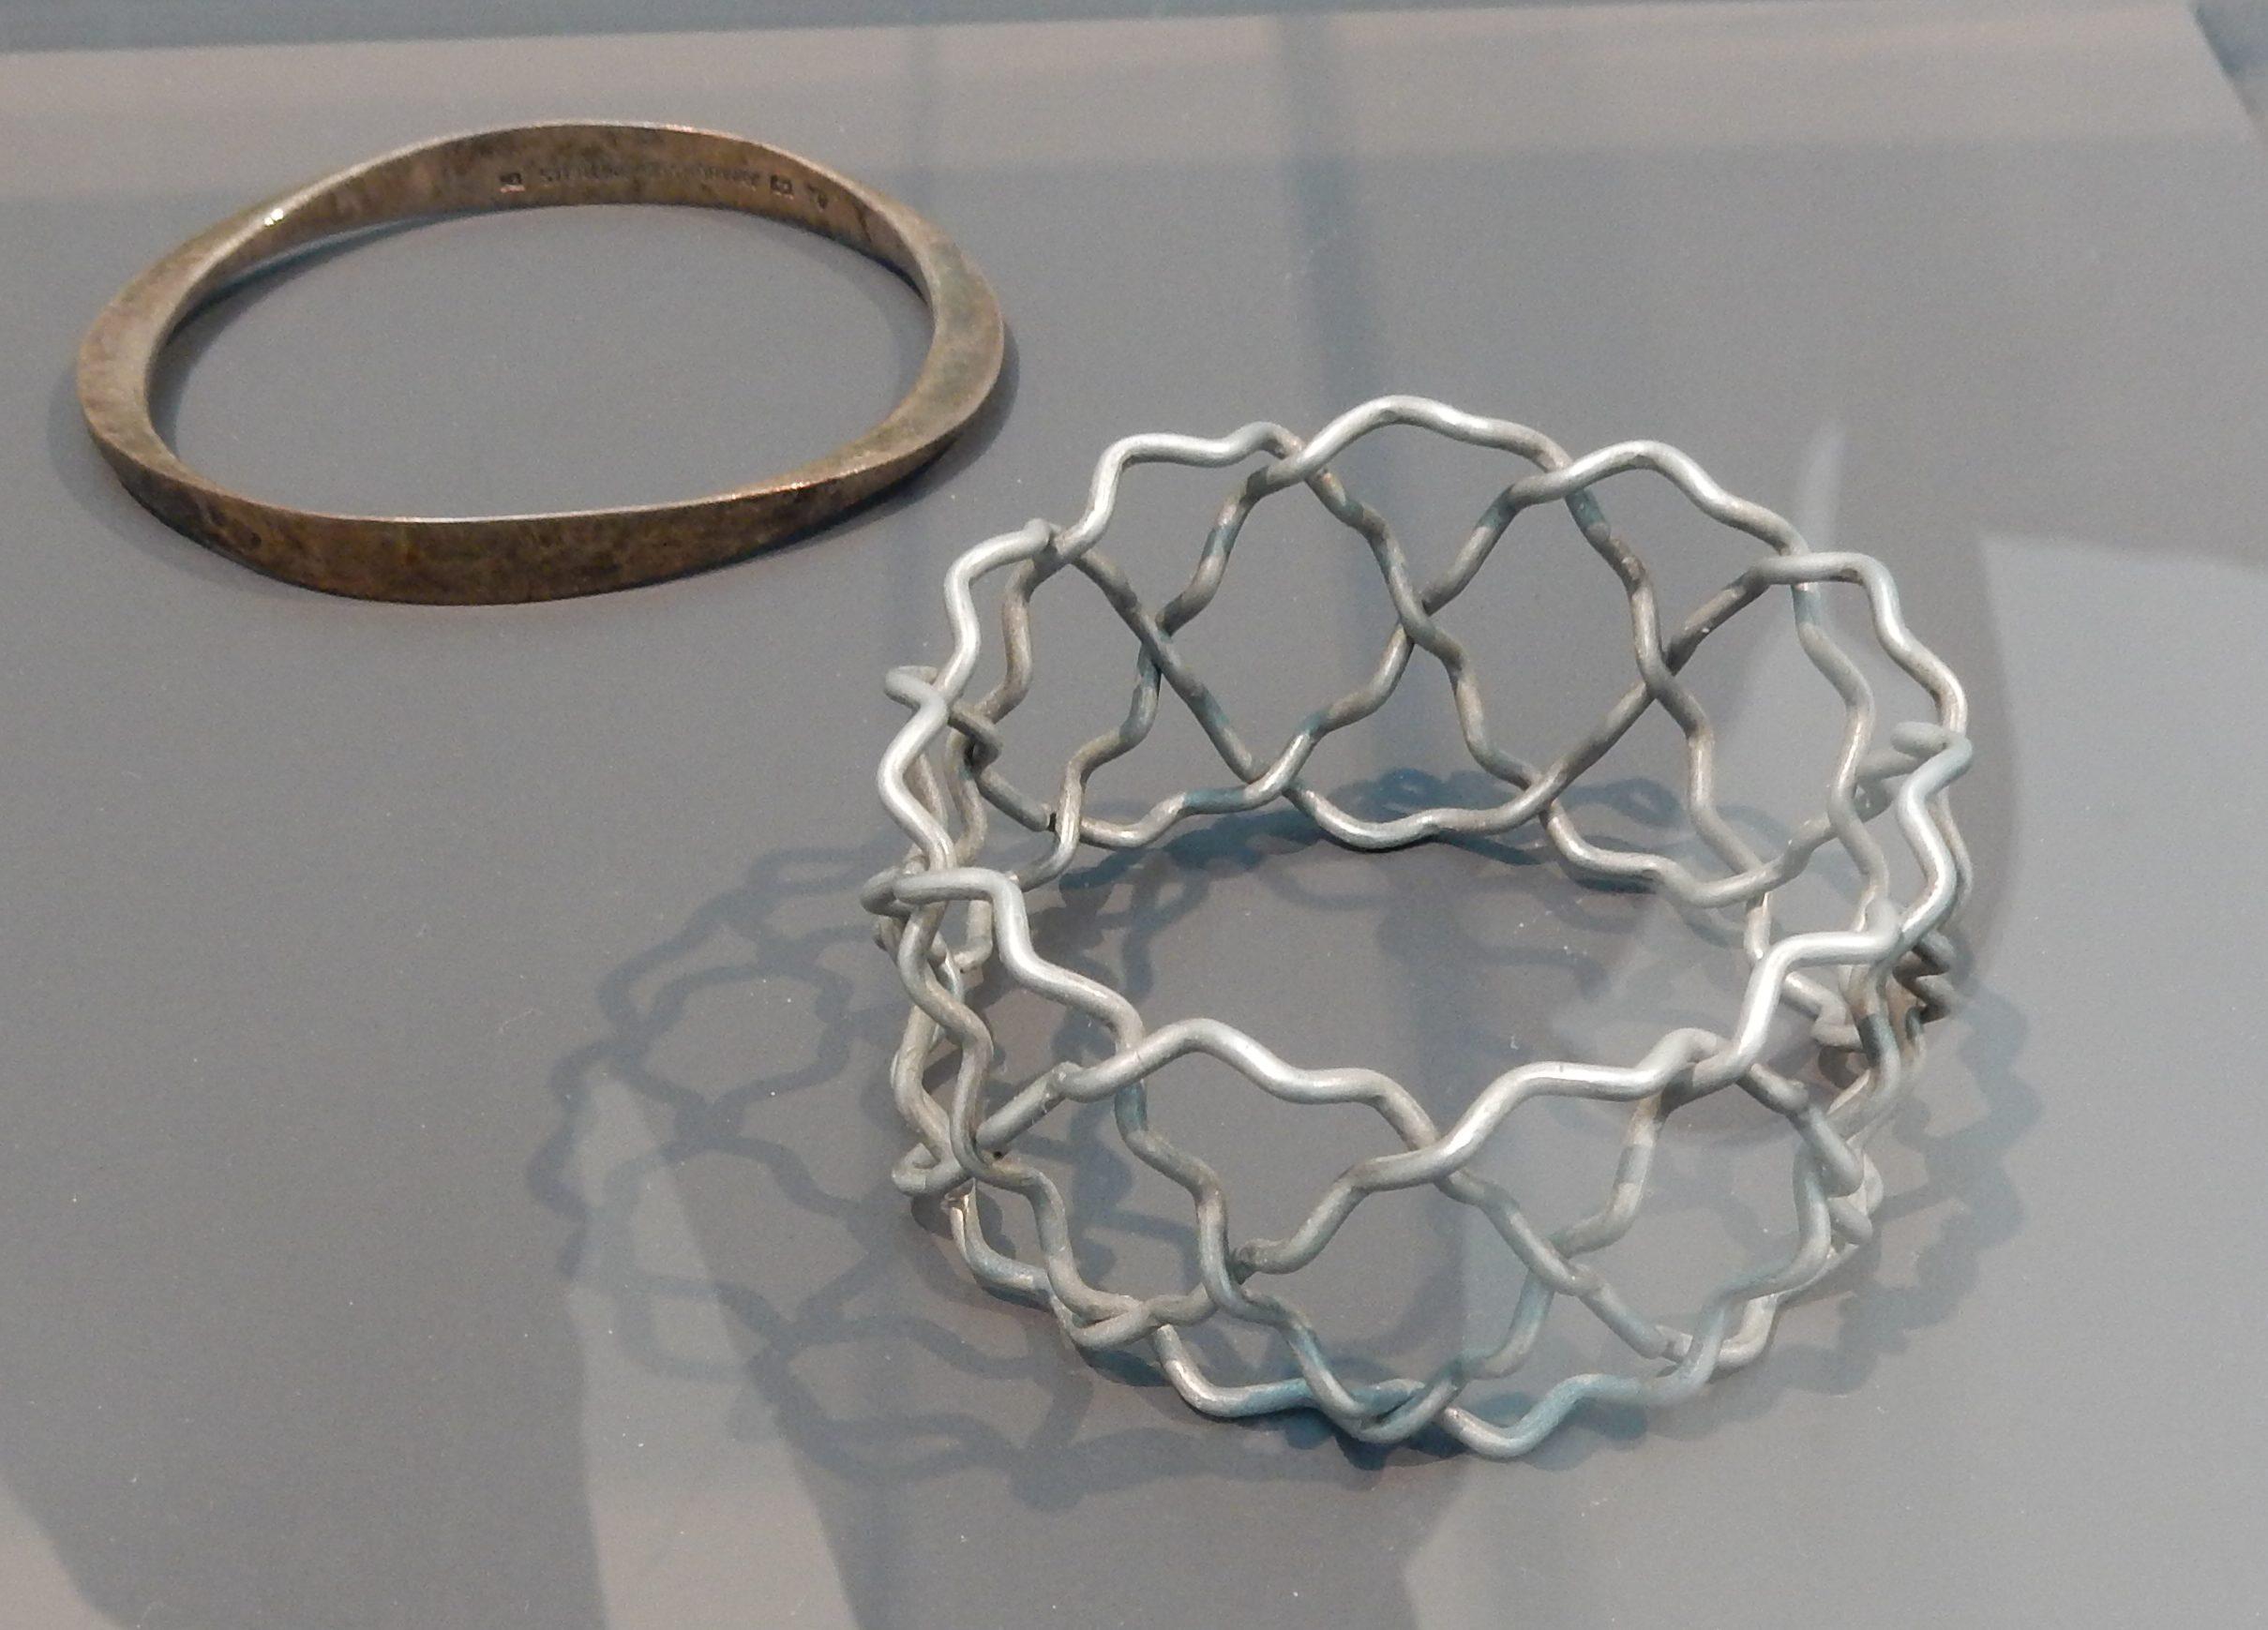 Tone Vigeland, Vered Kaminski, armbanden, 1959, 1992. Show yourself, Design Museum Den Bosch, 2018. Collectie Benno Premsela, metaal, tentoonstelling